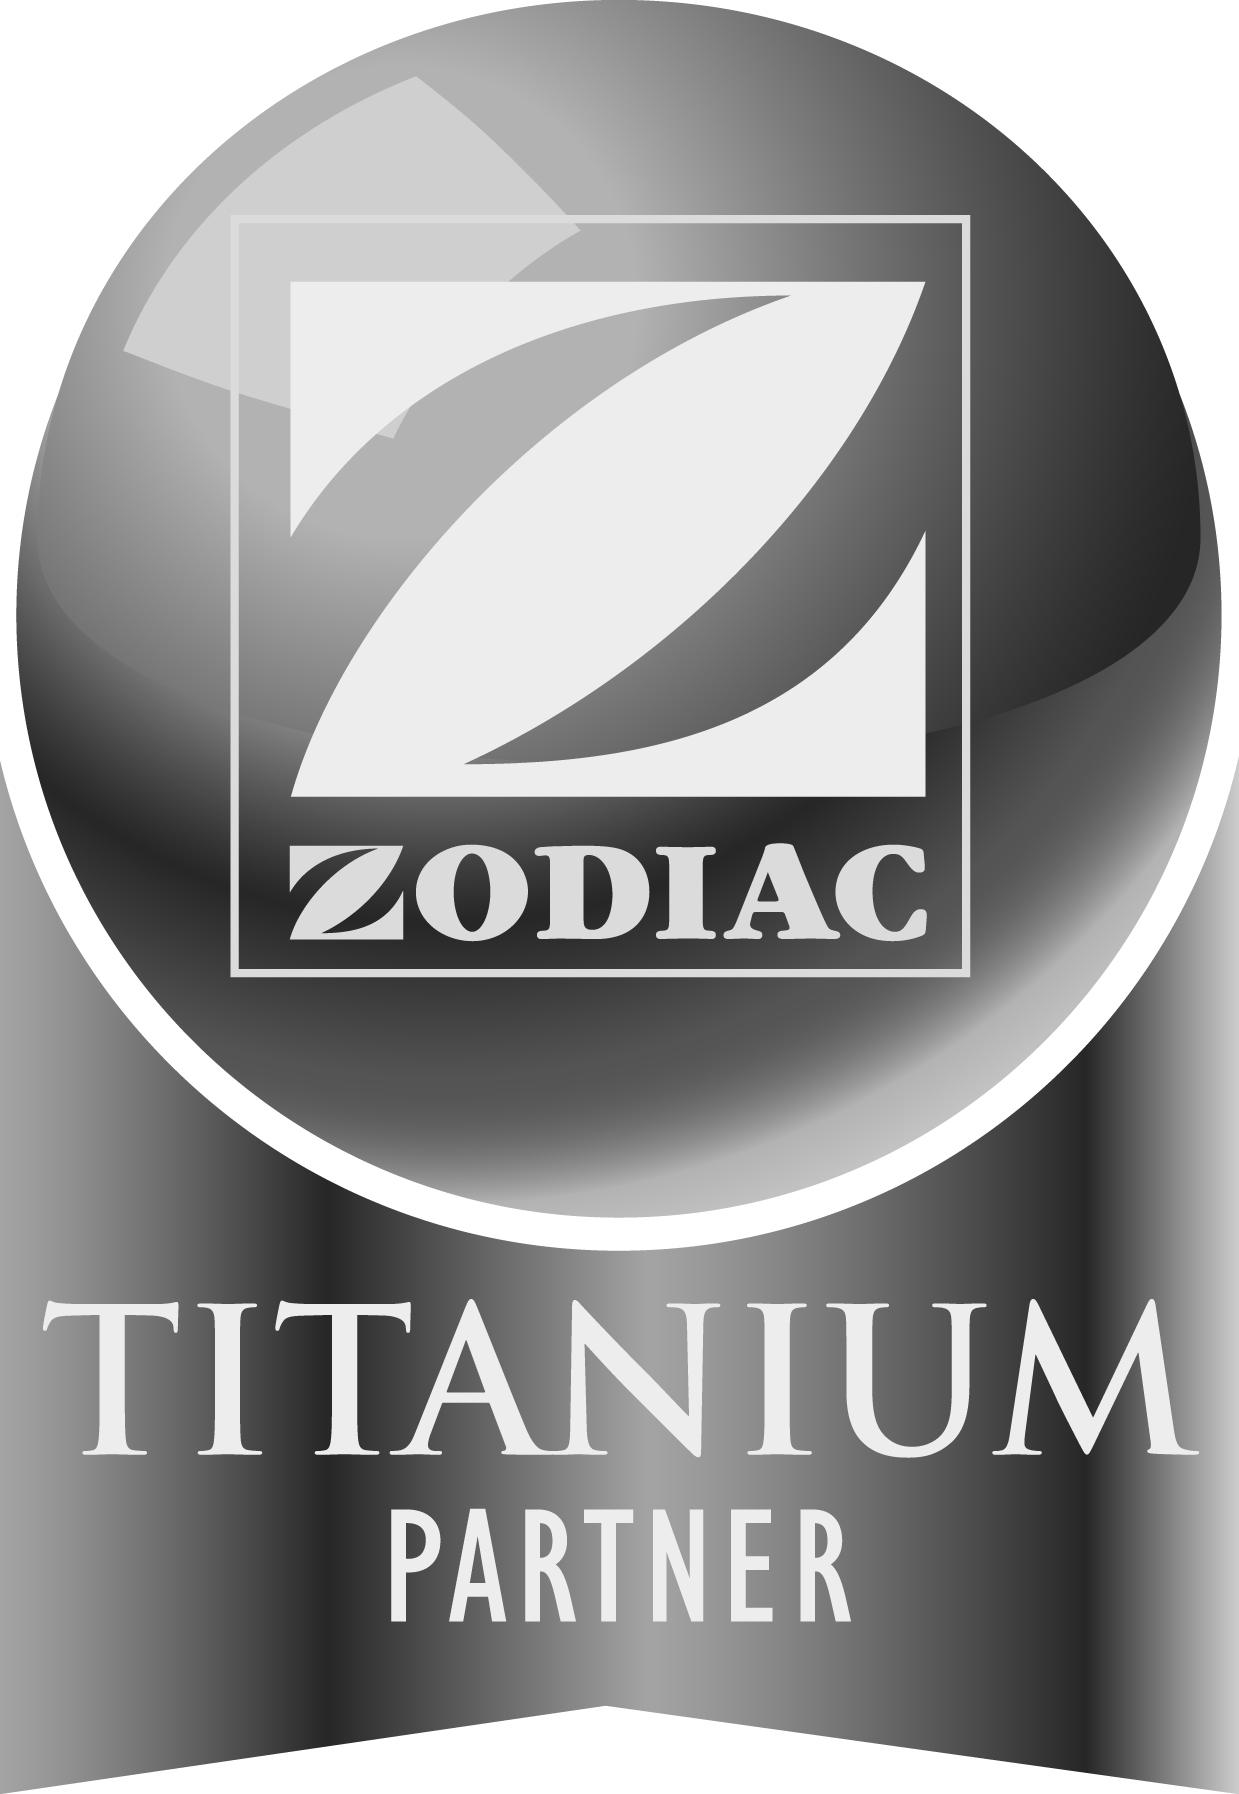 titanium-cmyk.jpg